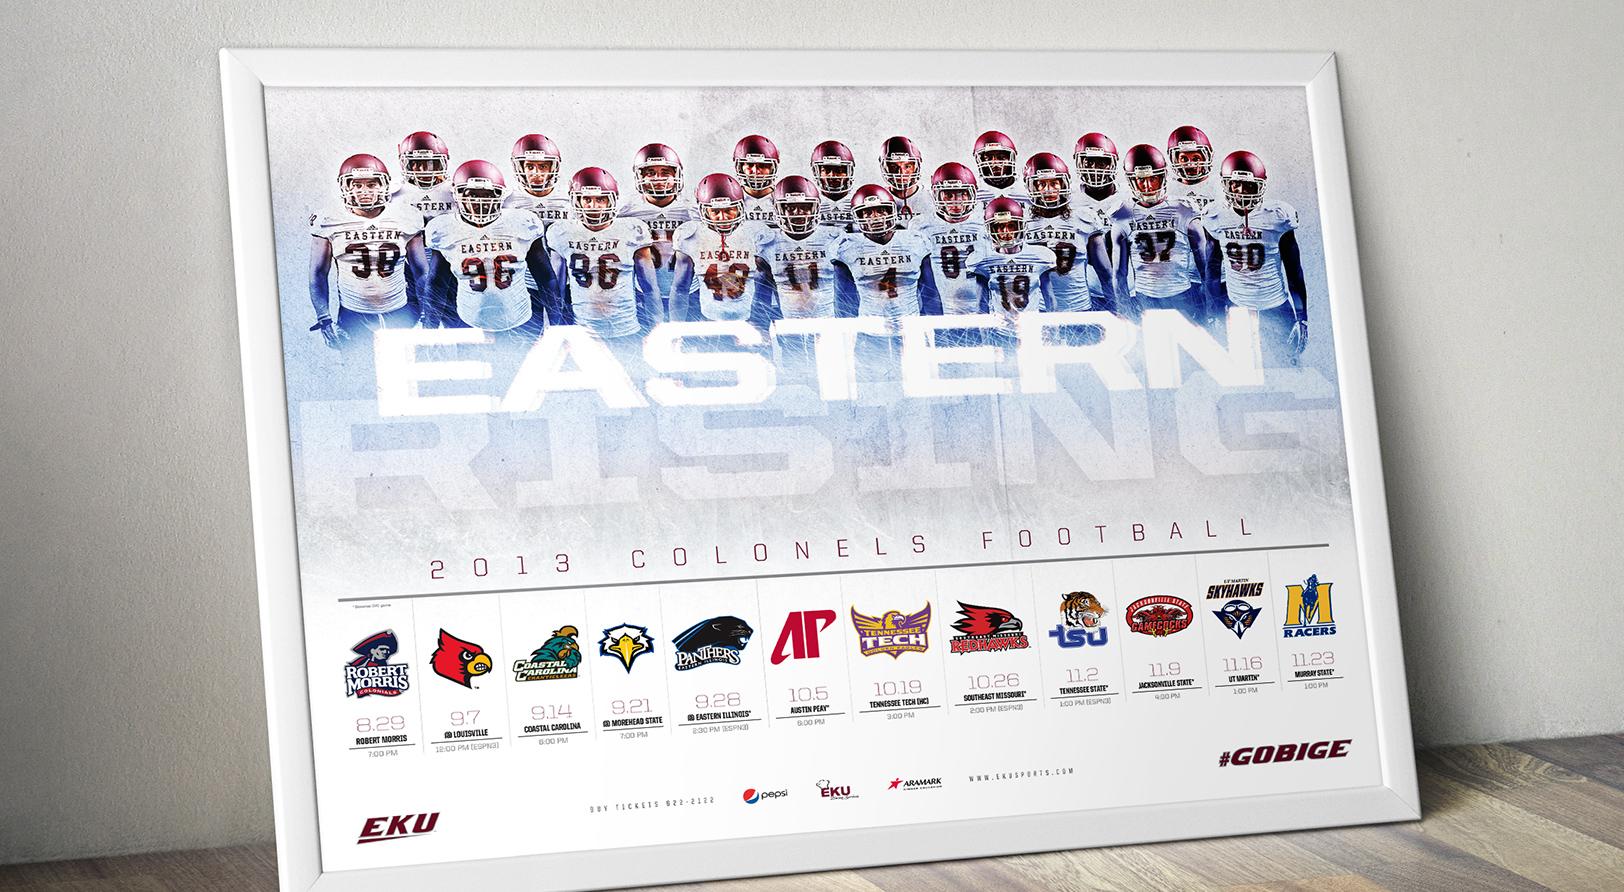 Sports design for the 2013 EKU football season's sports marketing campaign